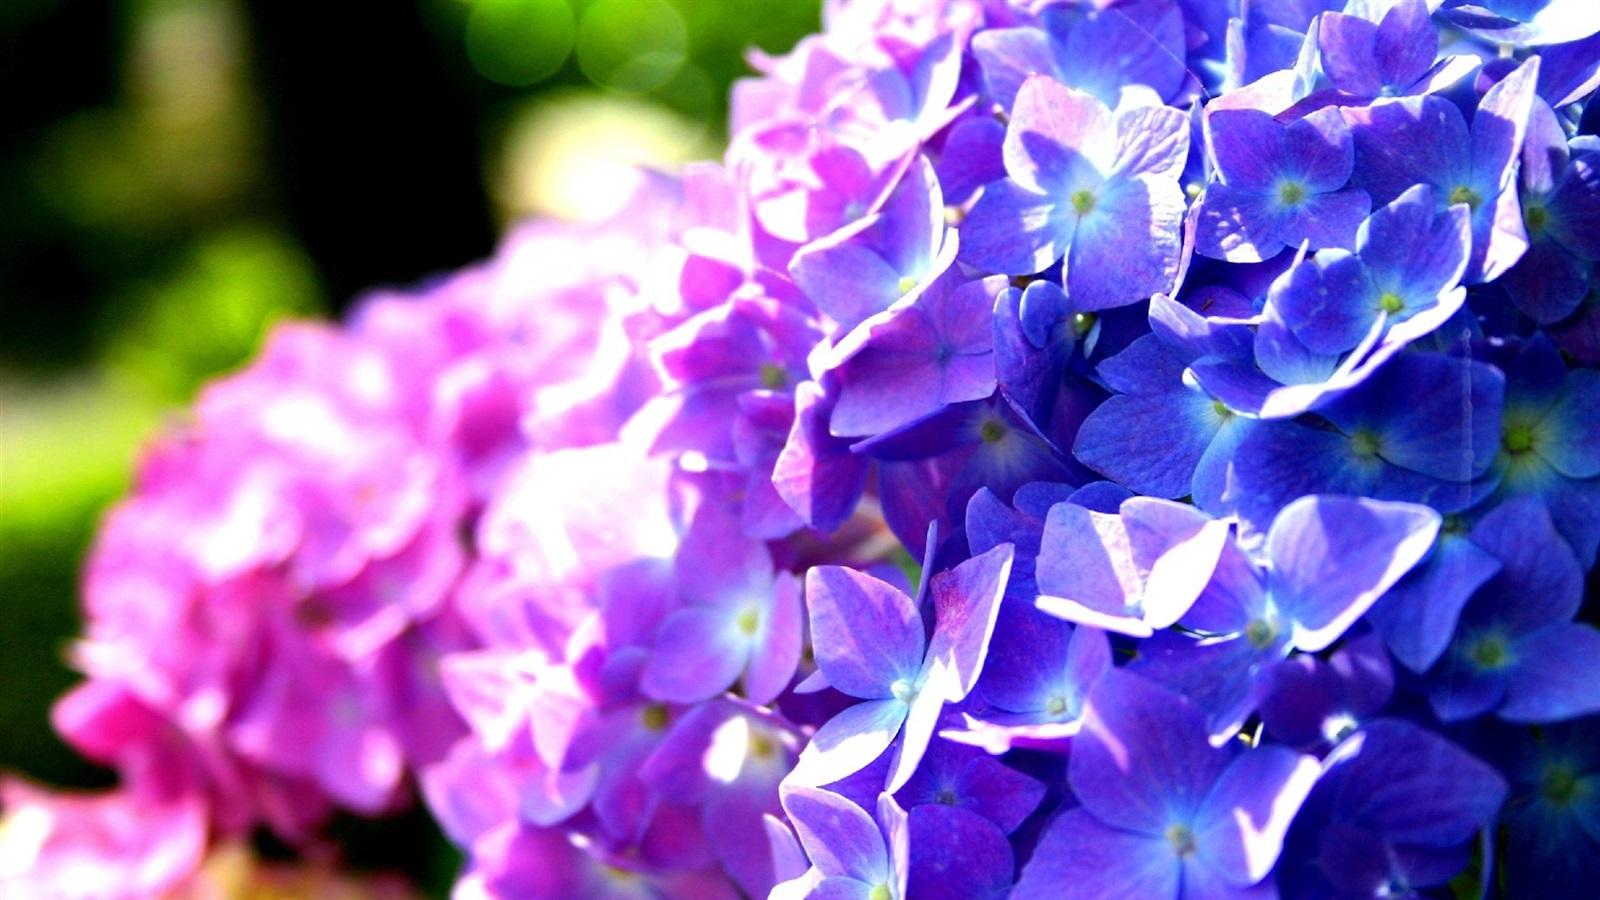 The Best Flowers 紫と青のアジサイの紫陽花 壁紙 1600x900 壁紙ダウンロード Ja Best Wallpaper Net